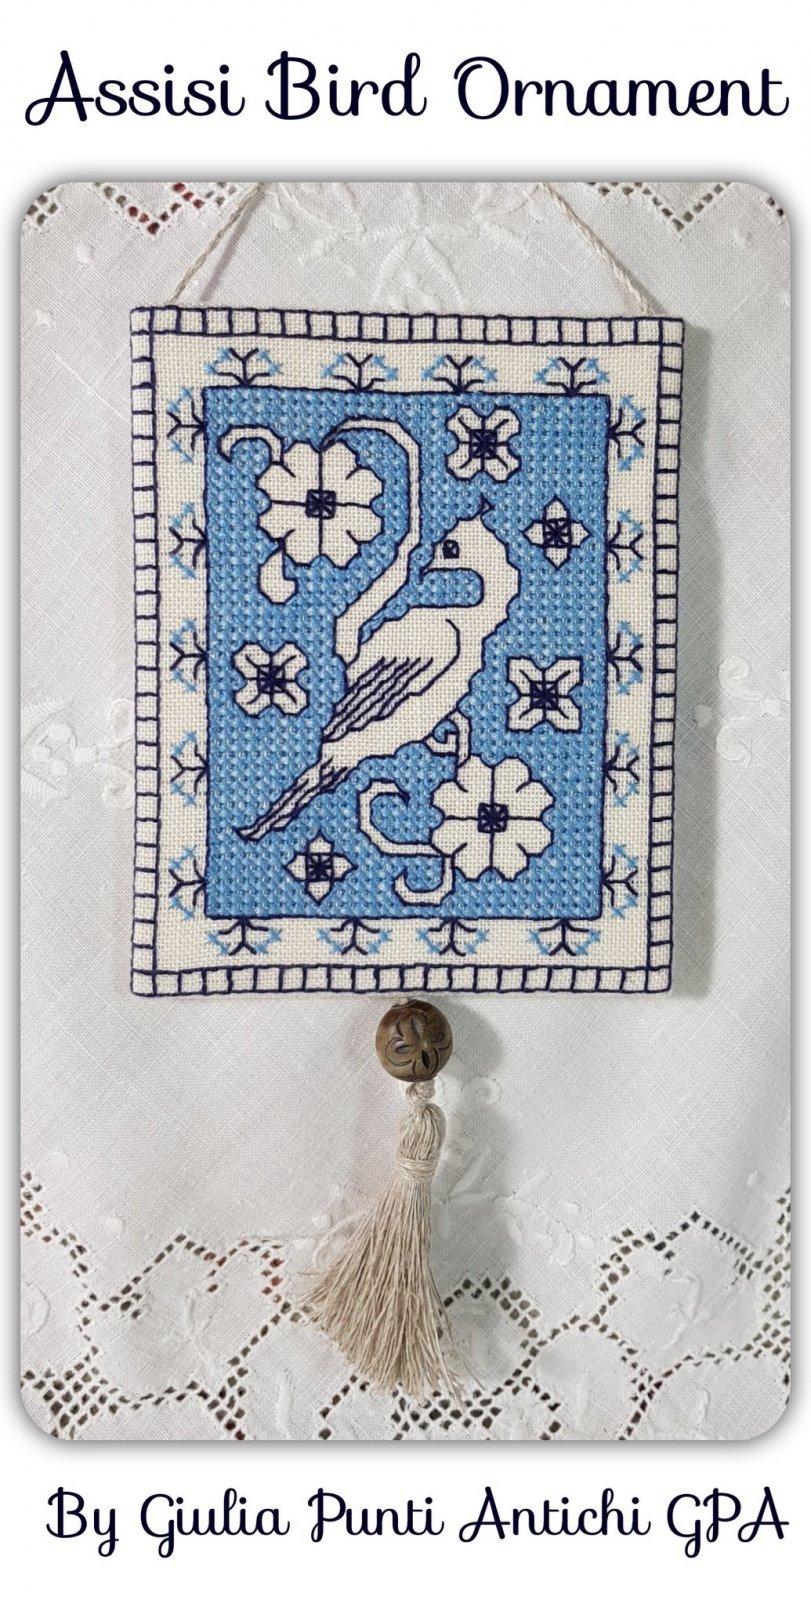 Guilia Punti Antichi Assisi Bird Ornament